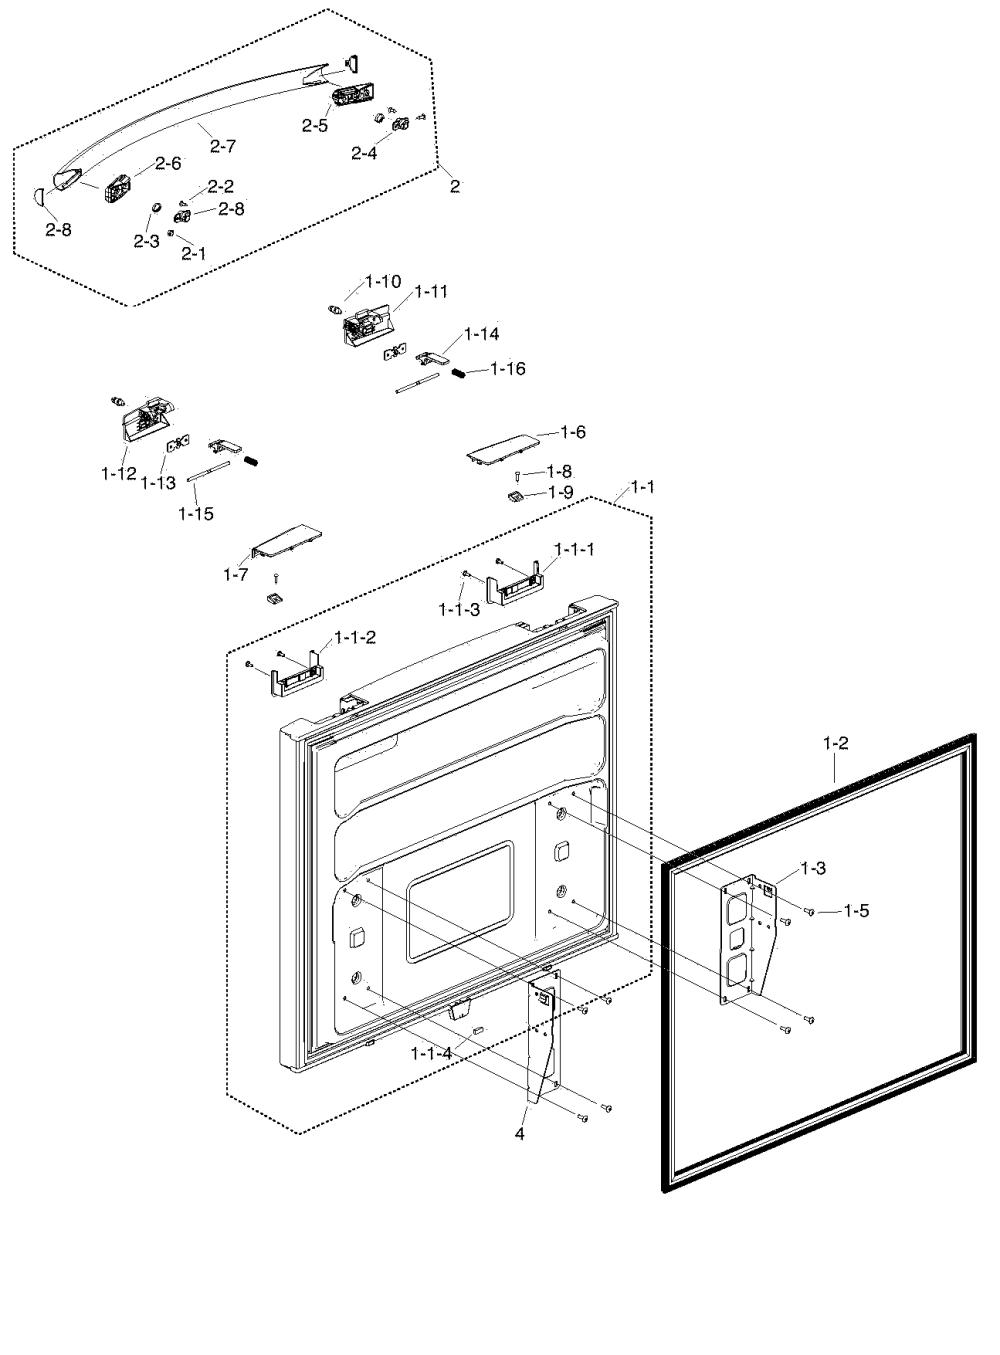 medium resolution of samsung rf217acbp xaa 00 freezer door diagram